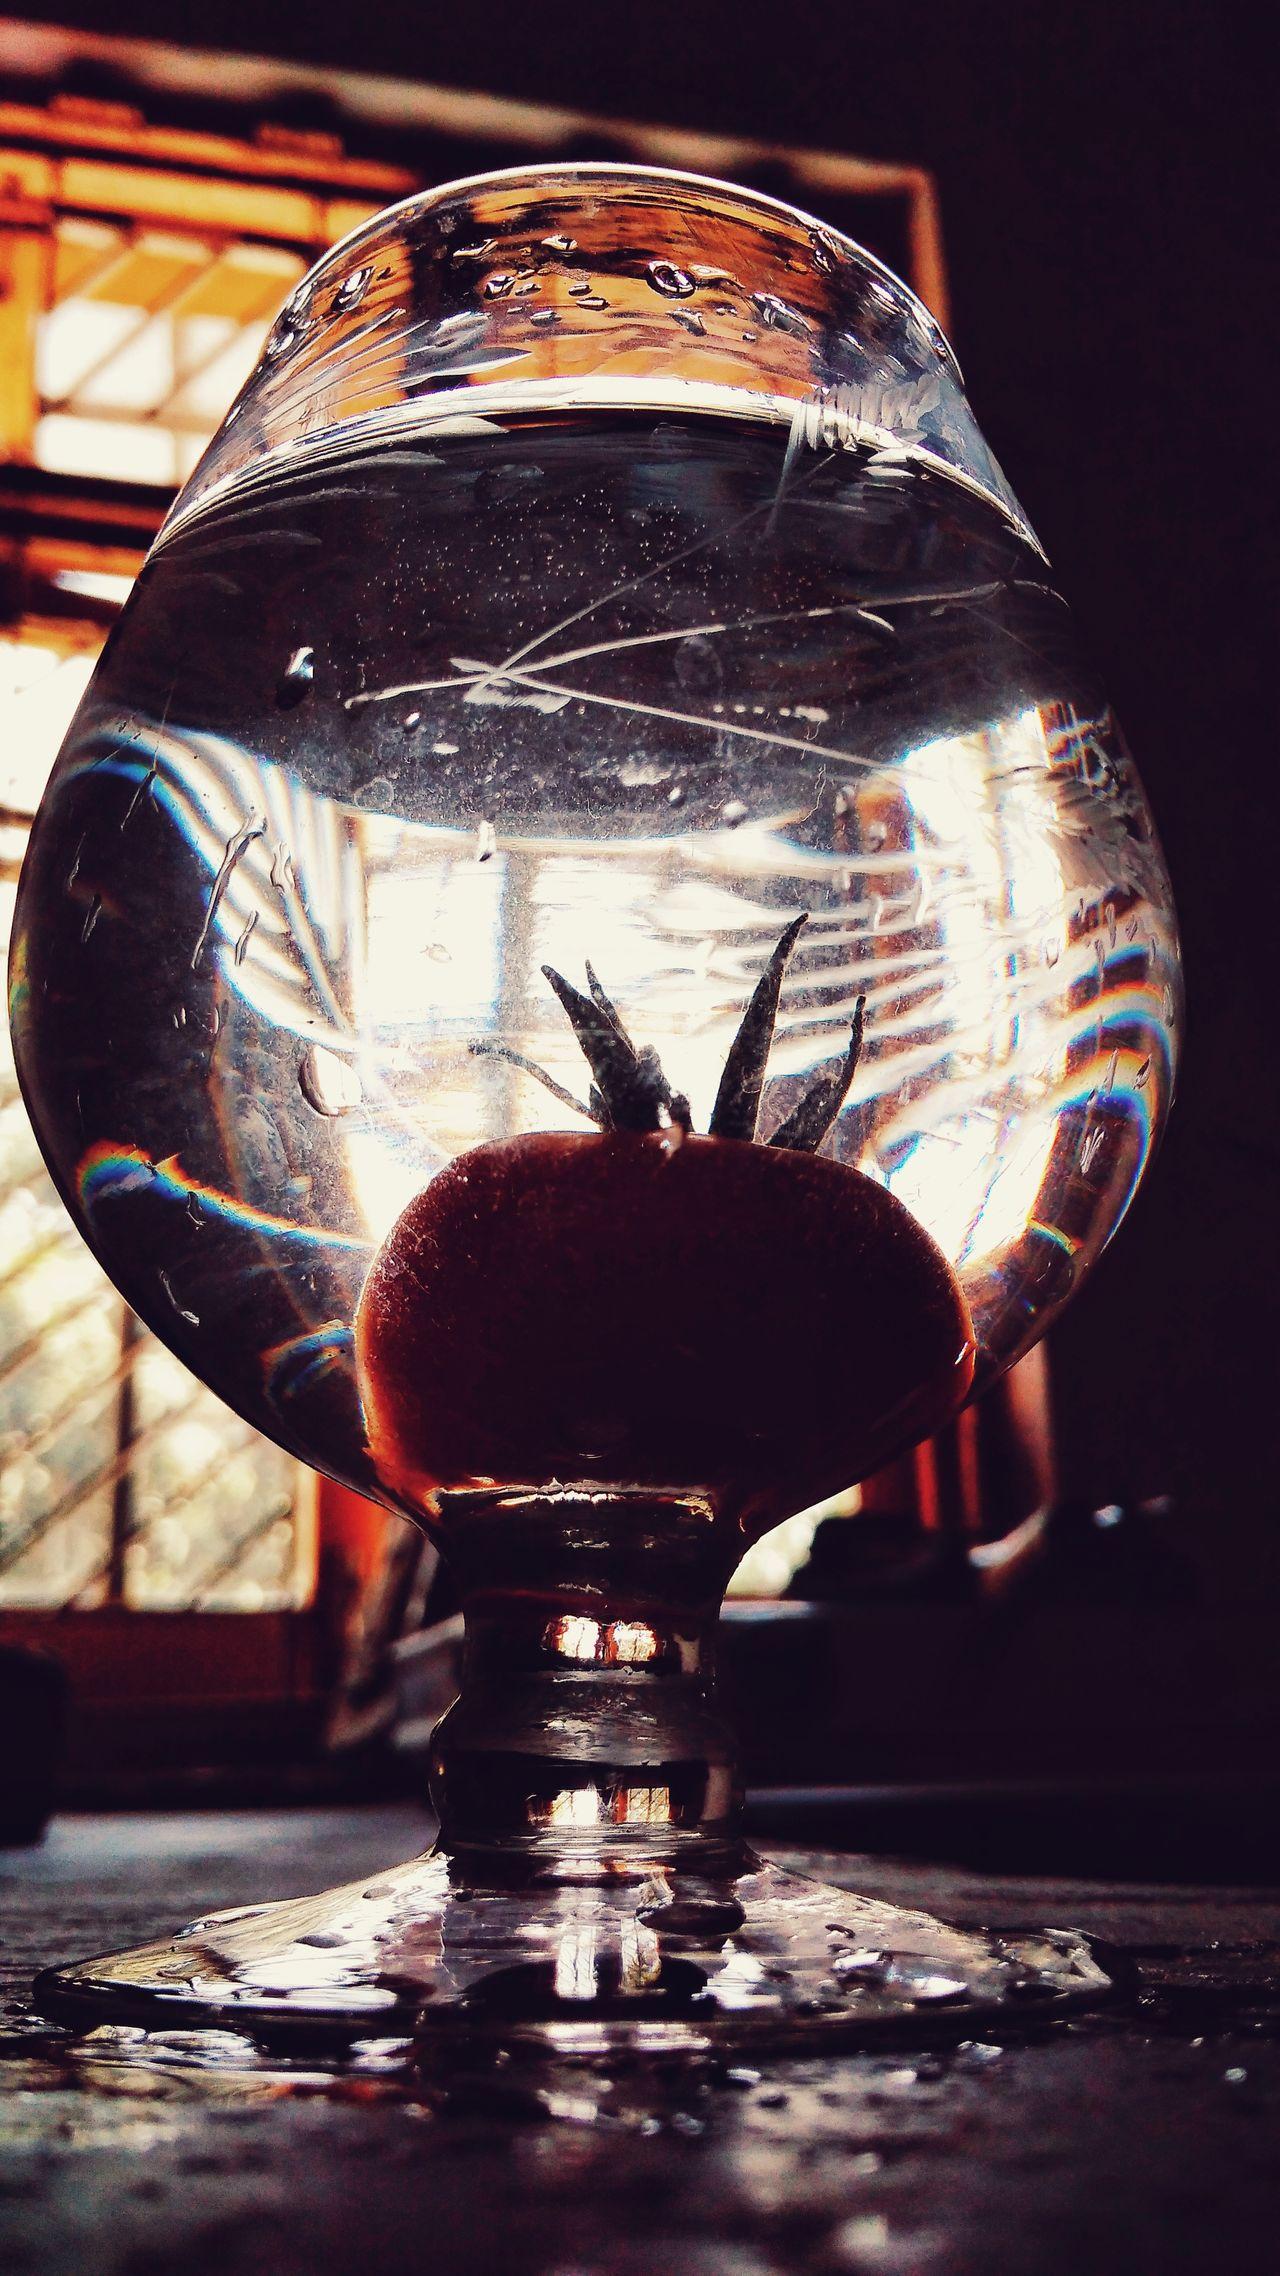 ©kavita_choudhary_photography Water Indoors  No People EyeEmNewHere Photographer Photography The Portraitist - 2017 EyeEm Awards Tranquil Scene Tranquility Illuminated Mobileclick Pattern Silhouette Indoors  BYOPaper! Arts Culture And Entertainment Jammudiary Wineglass Art Tomatoes🍅🍅 Lowangleshot SunsLight Windowlighting BYOpaper